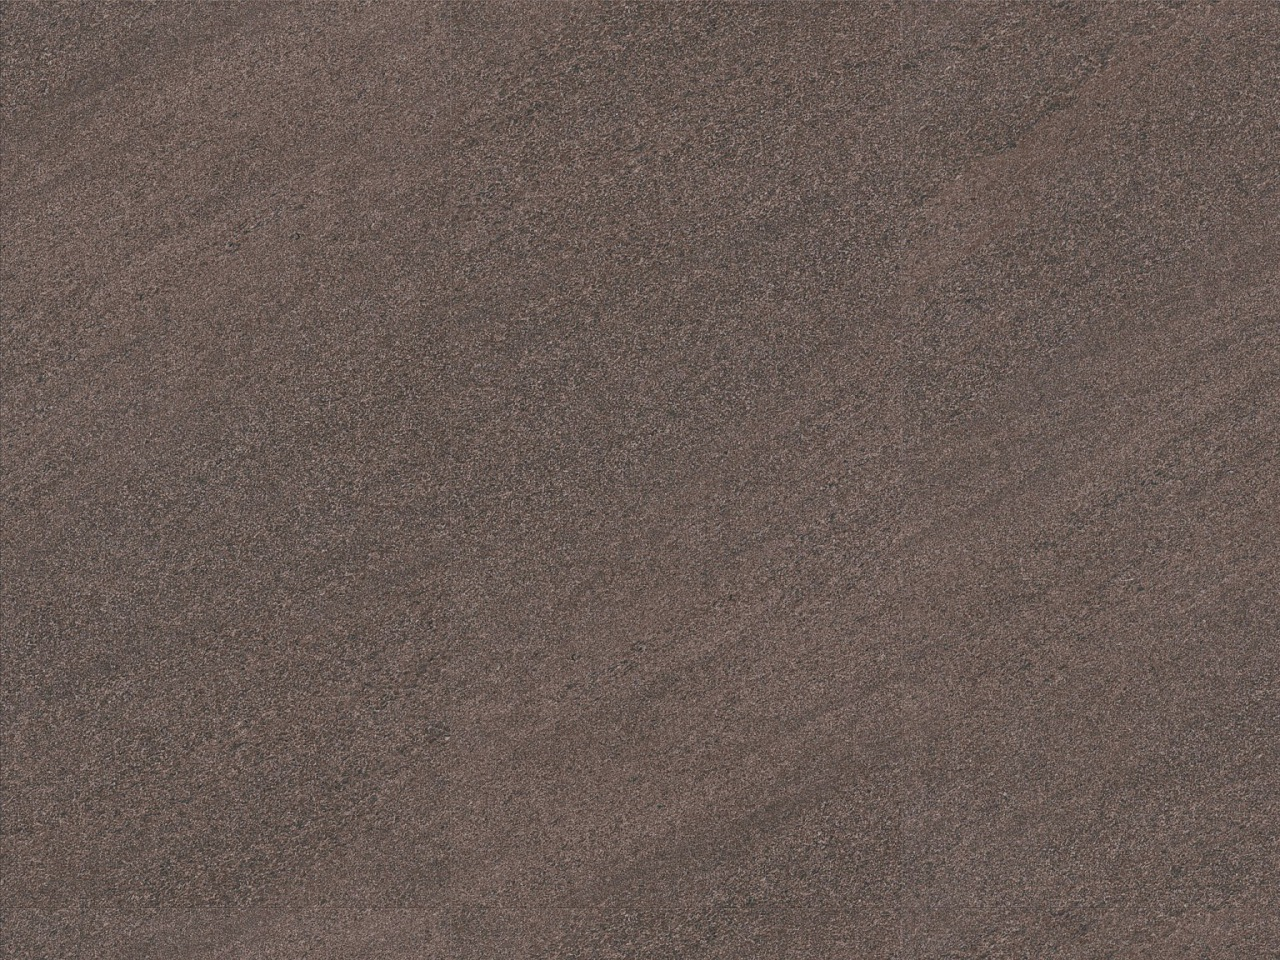 Designbelag Alesso stone – Granit Lille, 324008